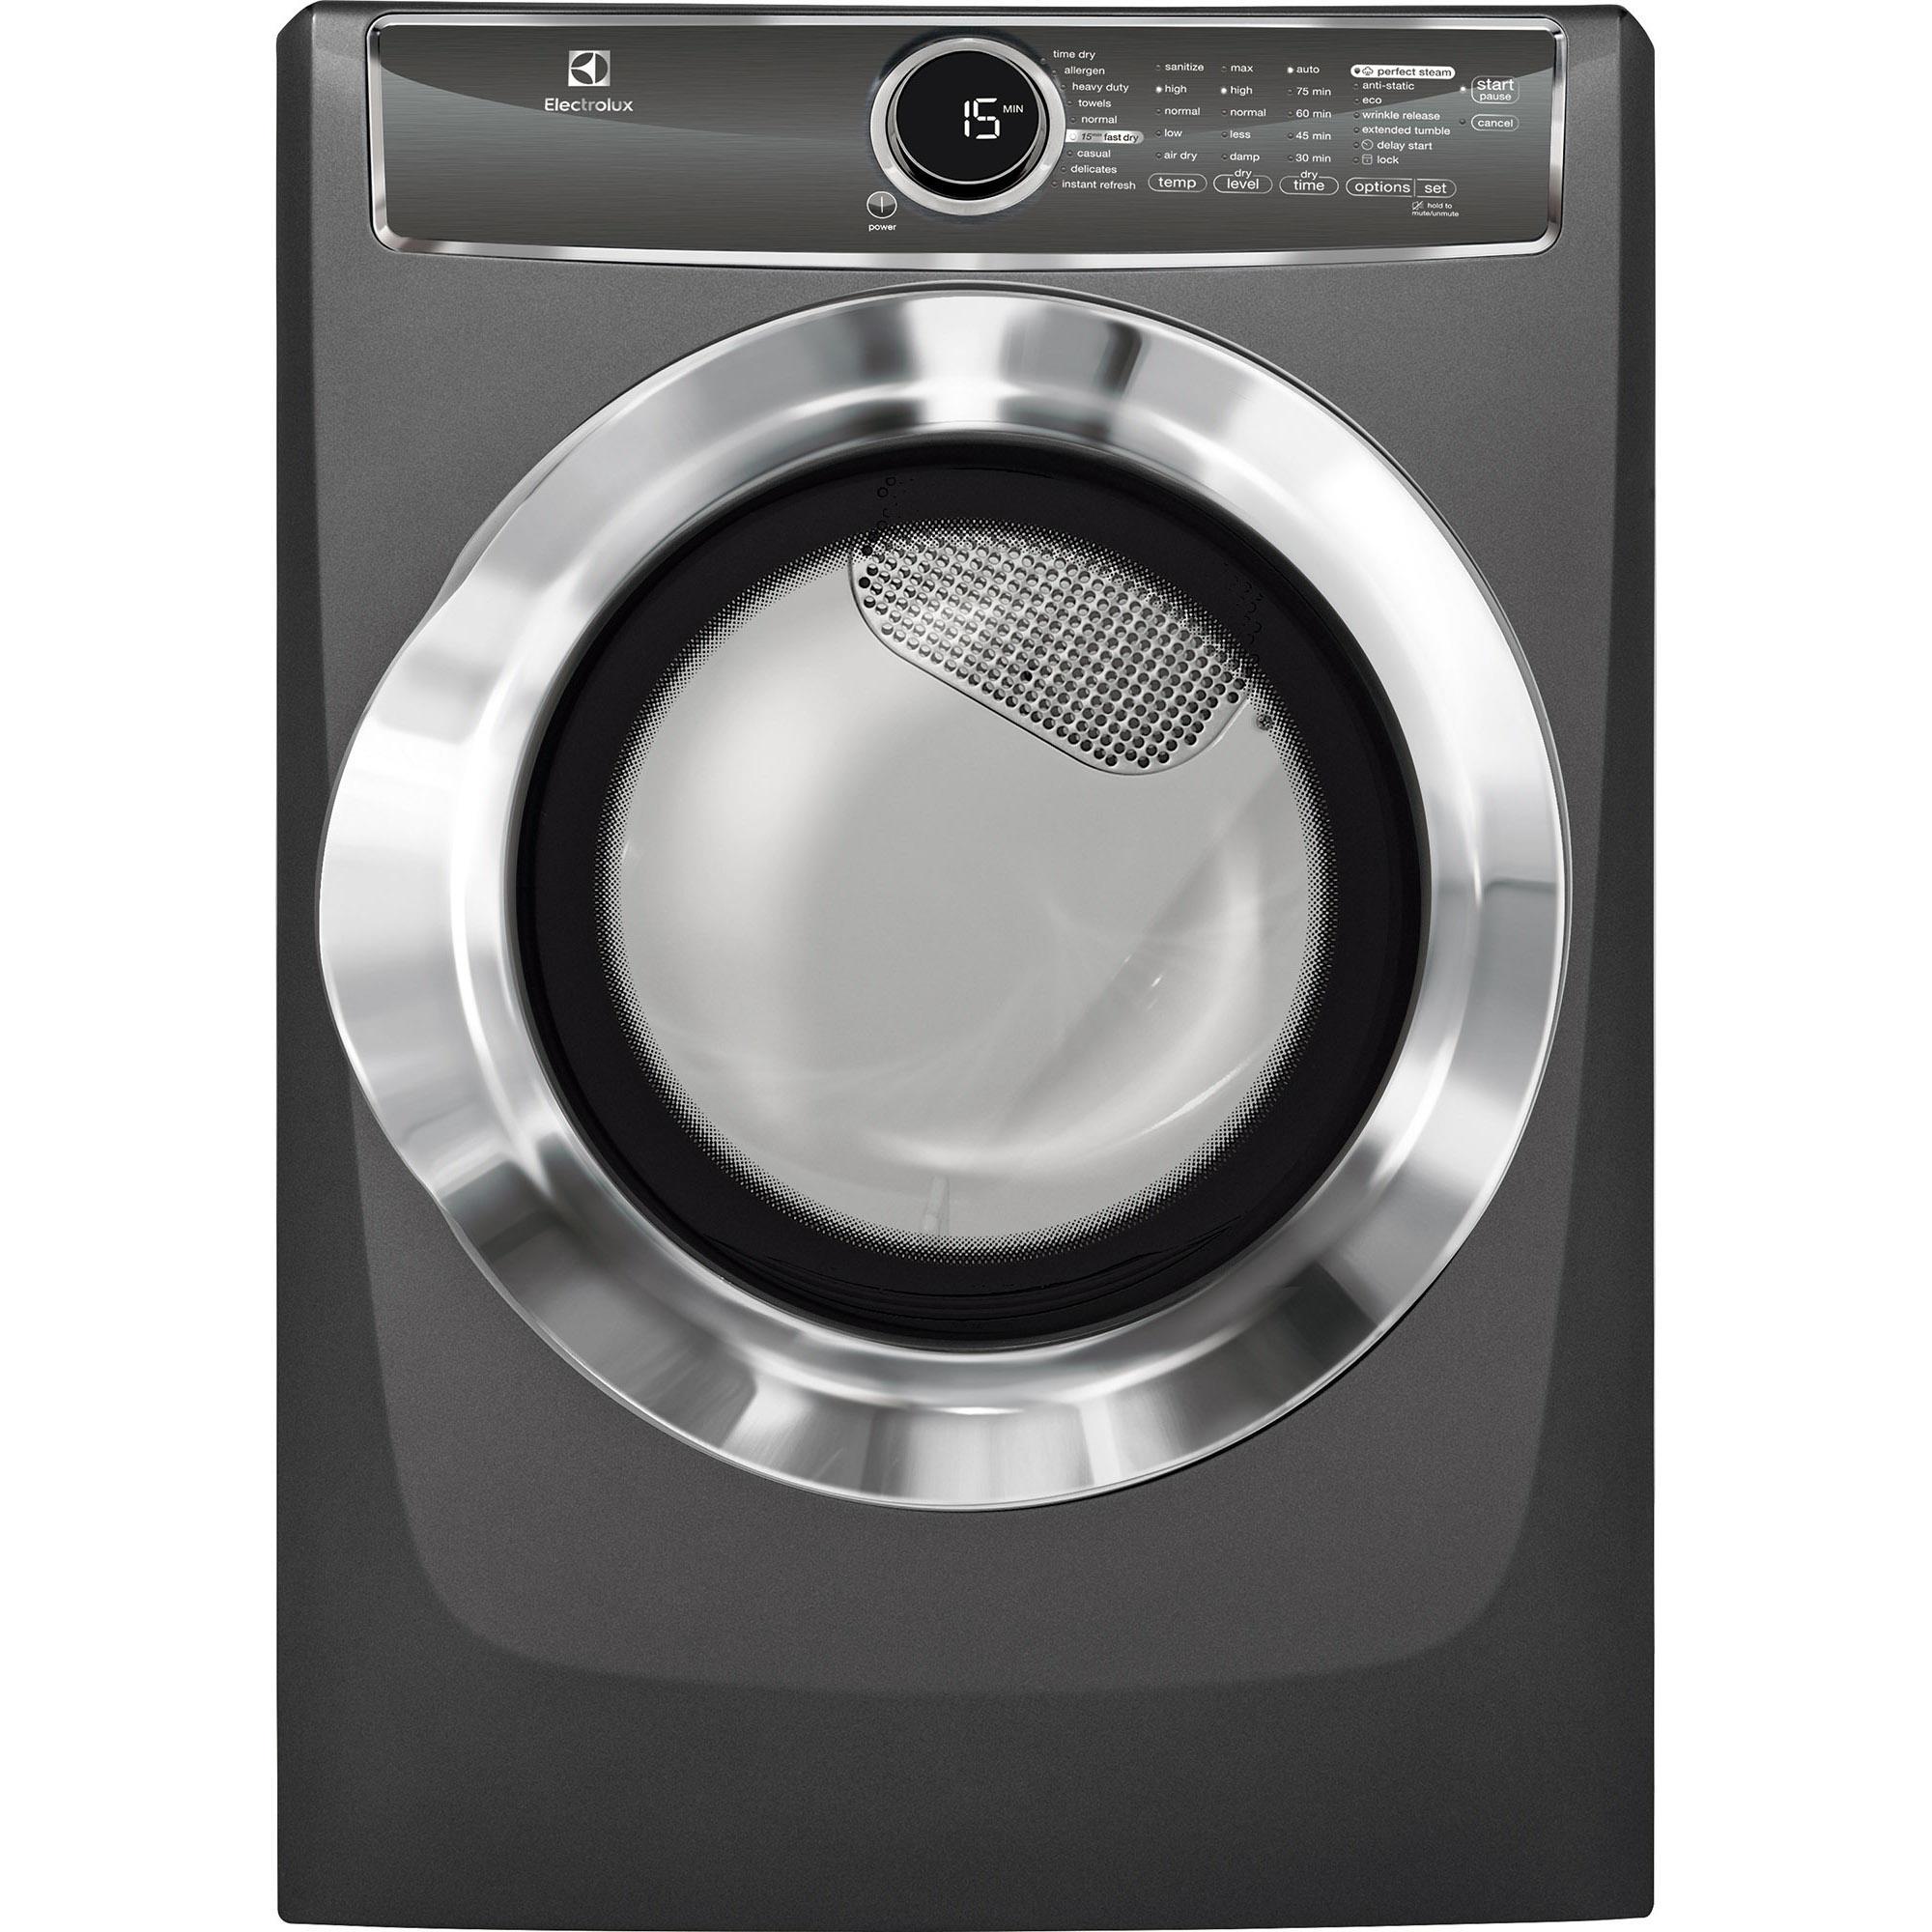 EFME617STT-8-0-cu-ft-Electric-Dryer-w-Allergen-Cycle-Titanium